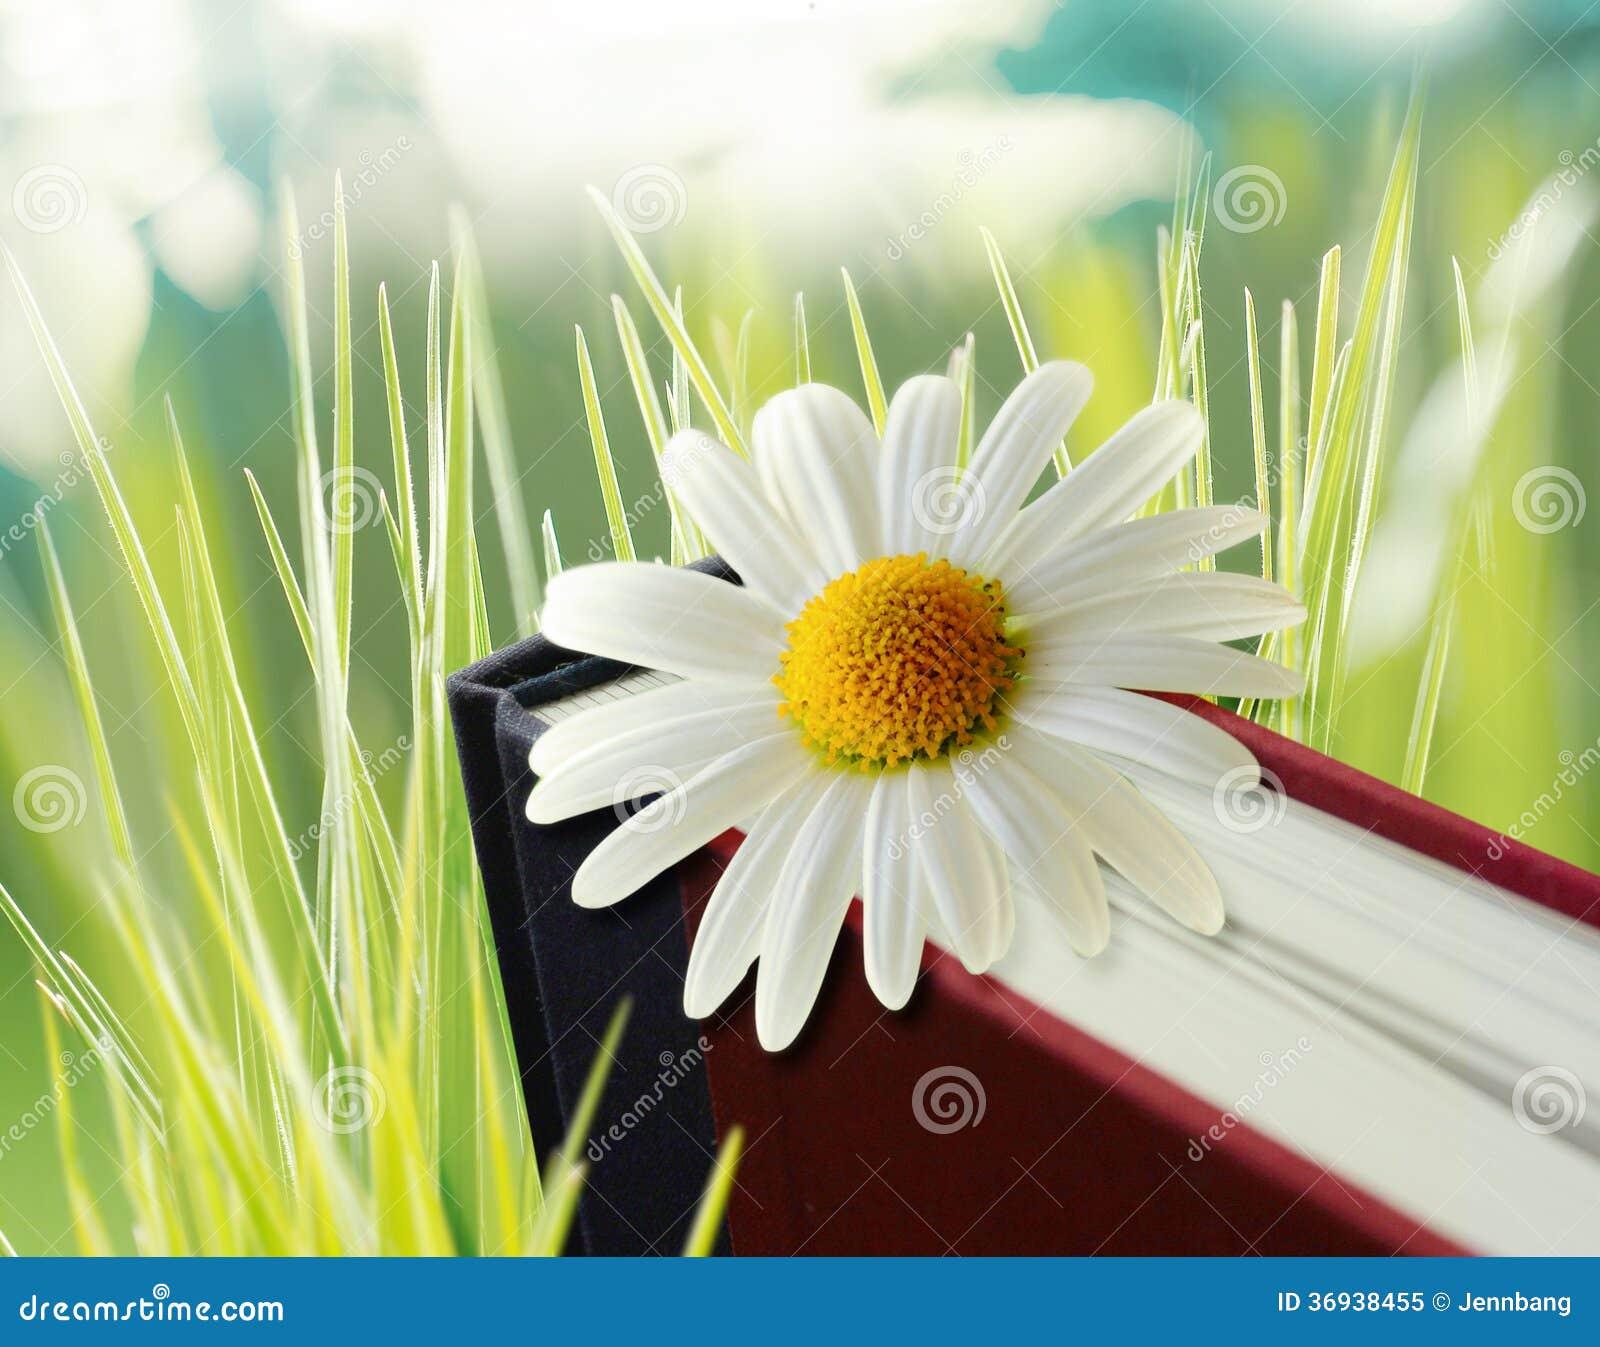 Daisy flower on book stock illustration illustration of bloom daisy flower on book izmirmasajfo